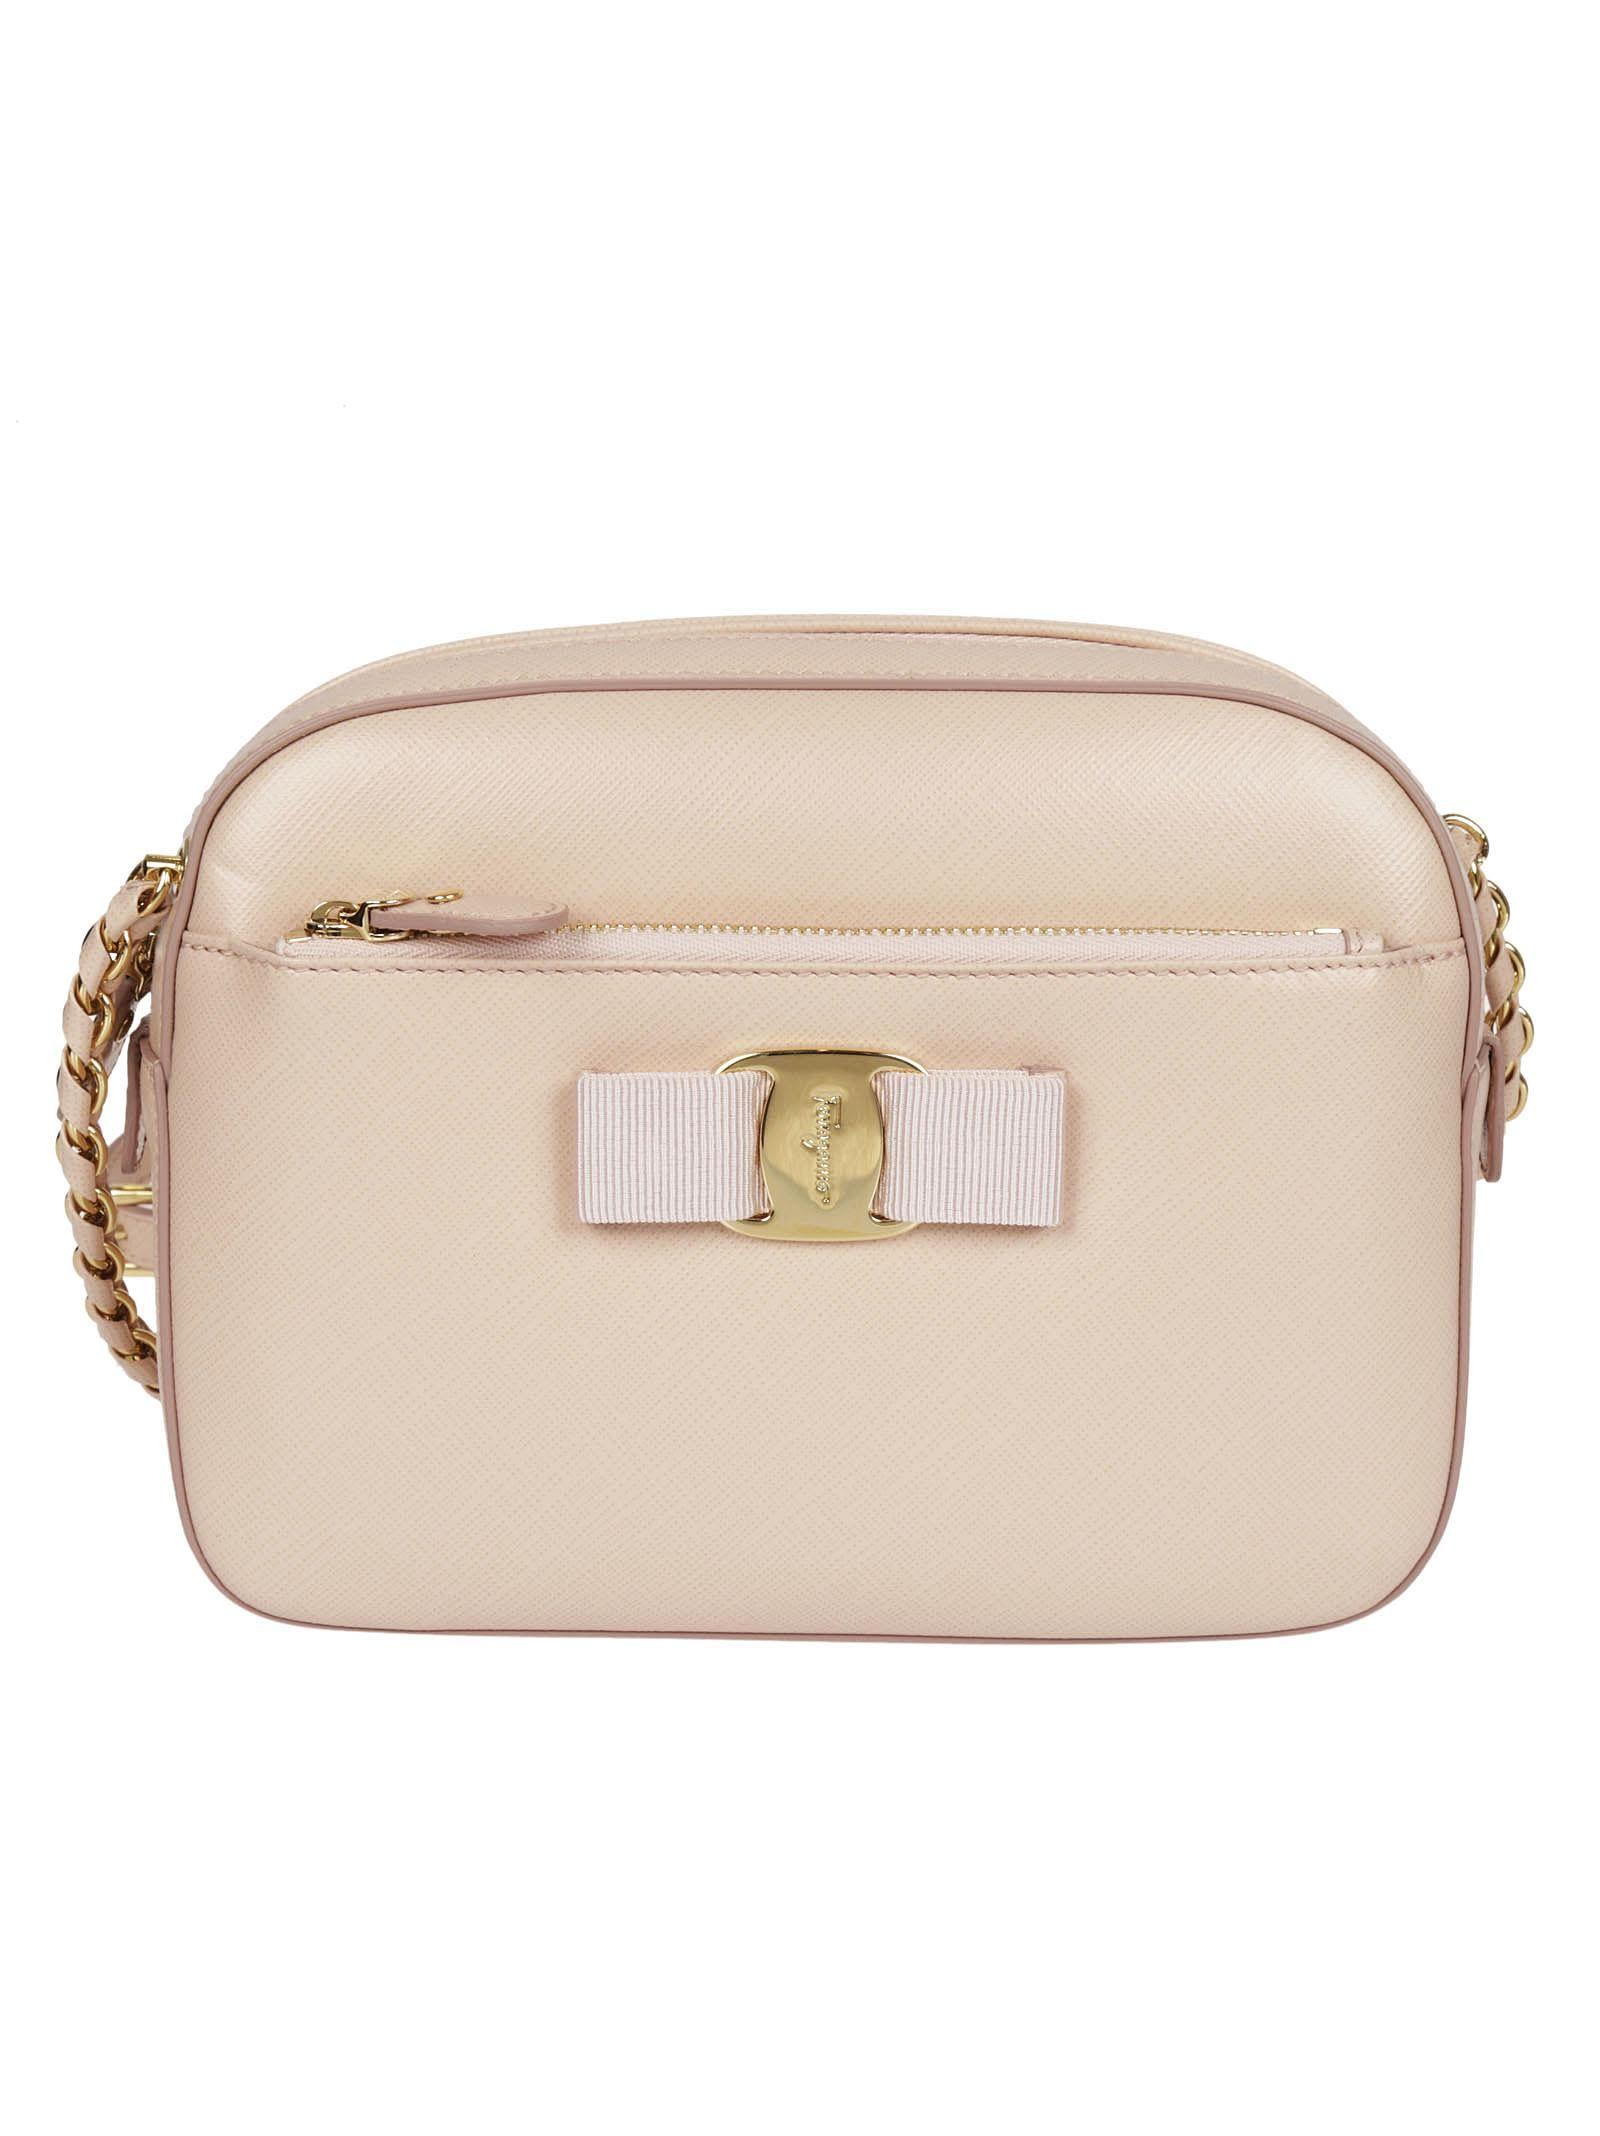 413c663925a6 Cross Body Handbags. Leather Bags. Messenger Bags. SALVATORE FERRAGAMO VARA  CAMERA BAG.  salvatoreferragamo  bags  shoulder bags  leather